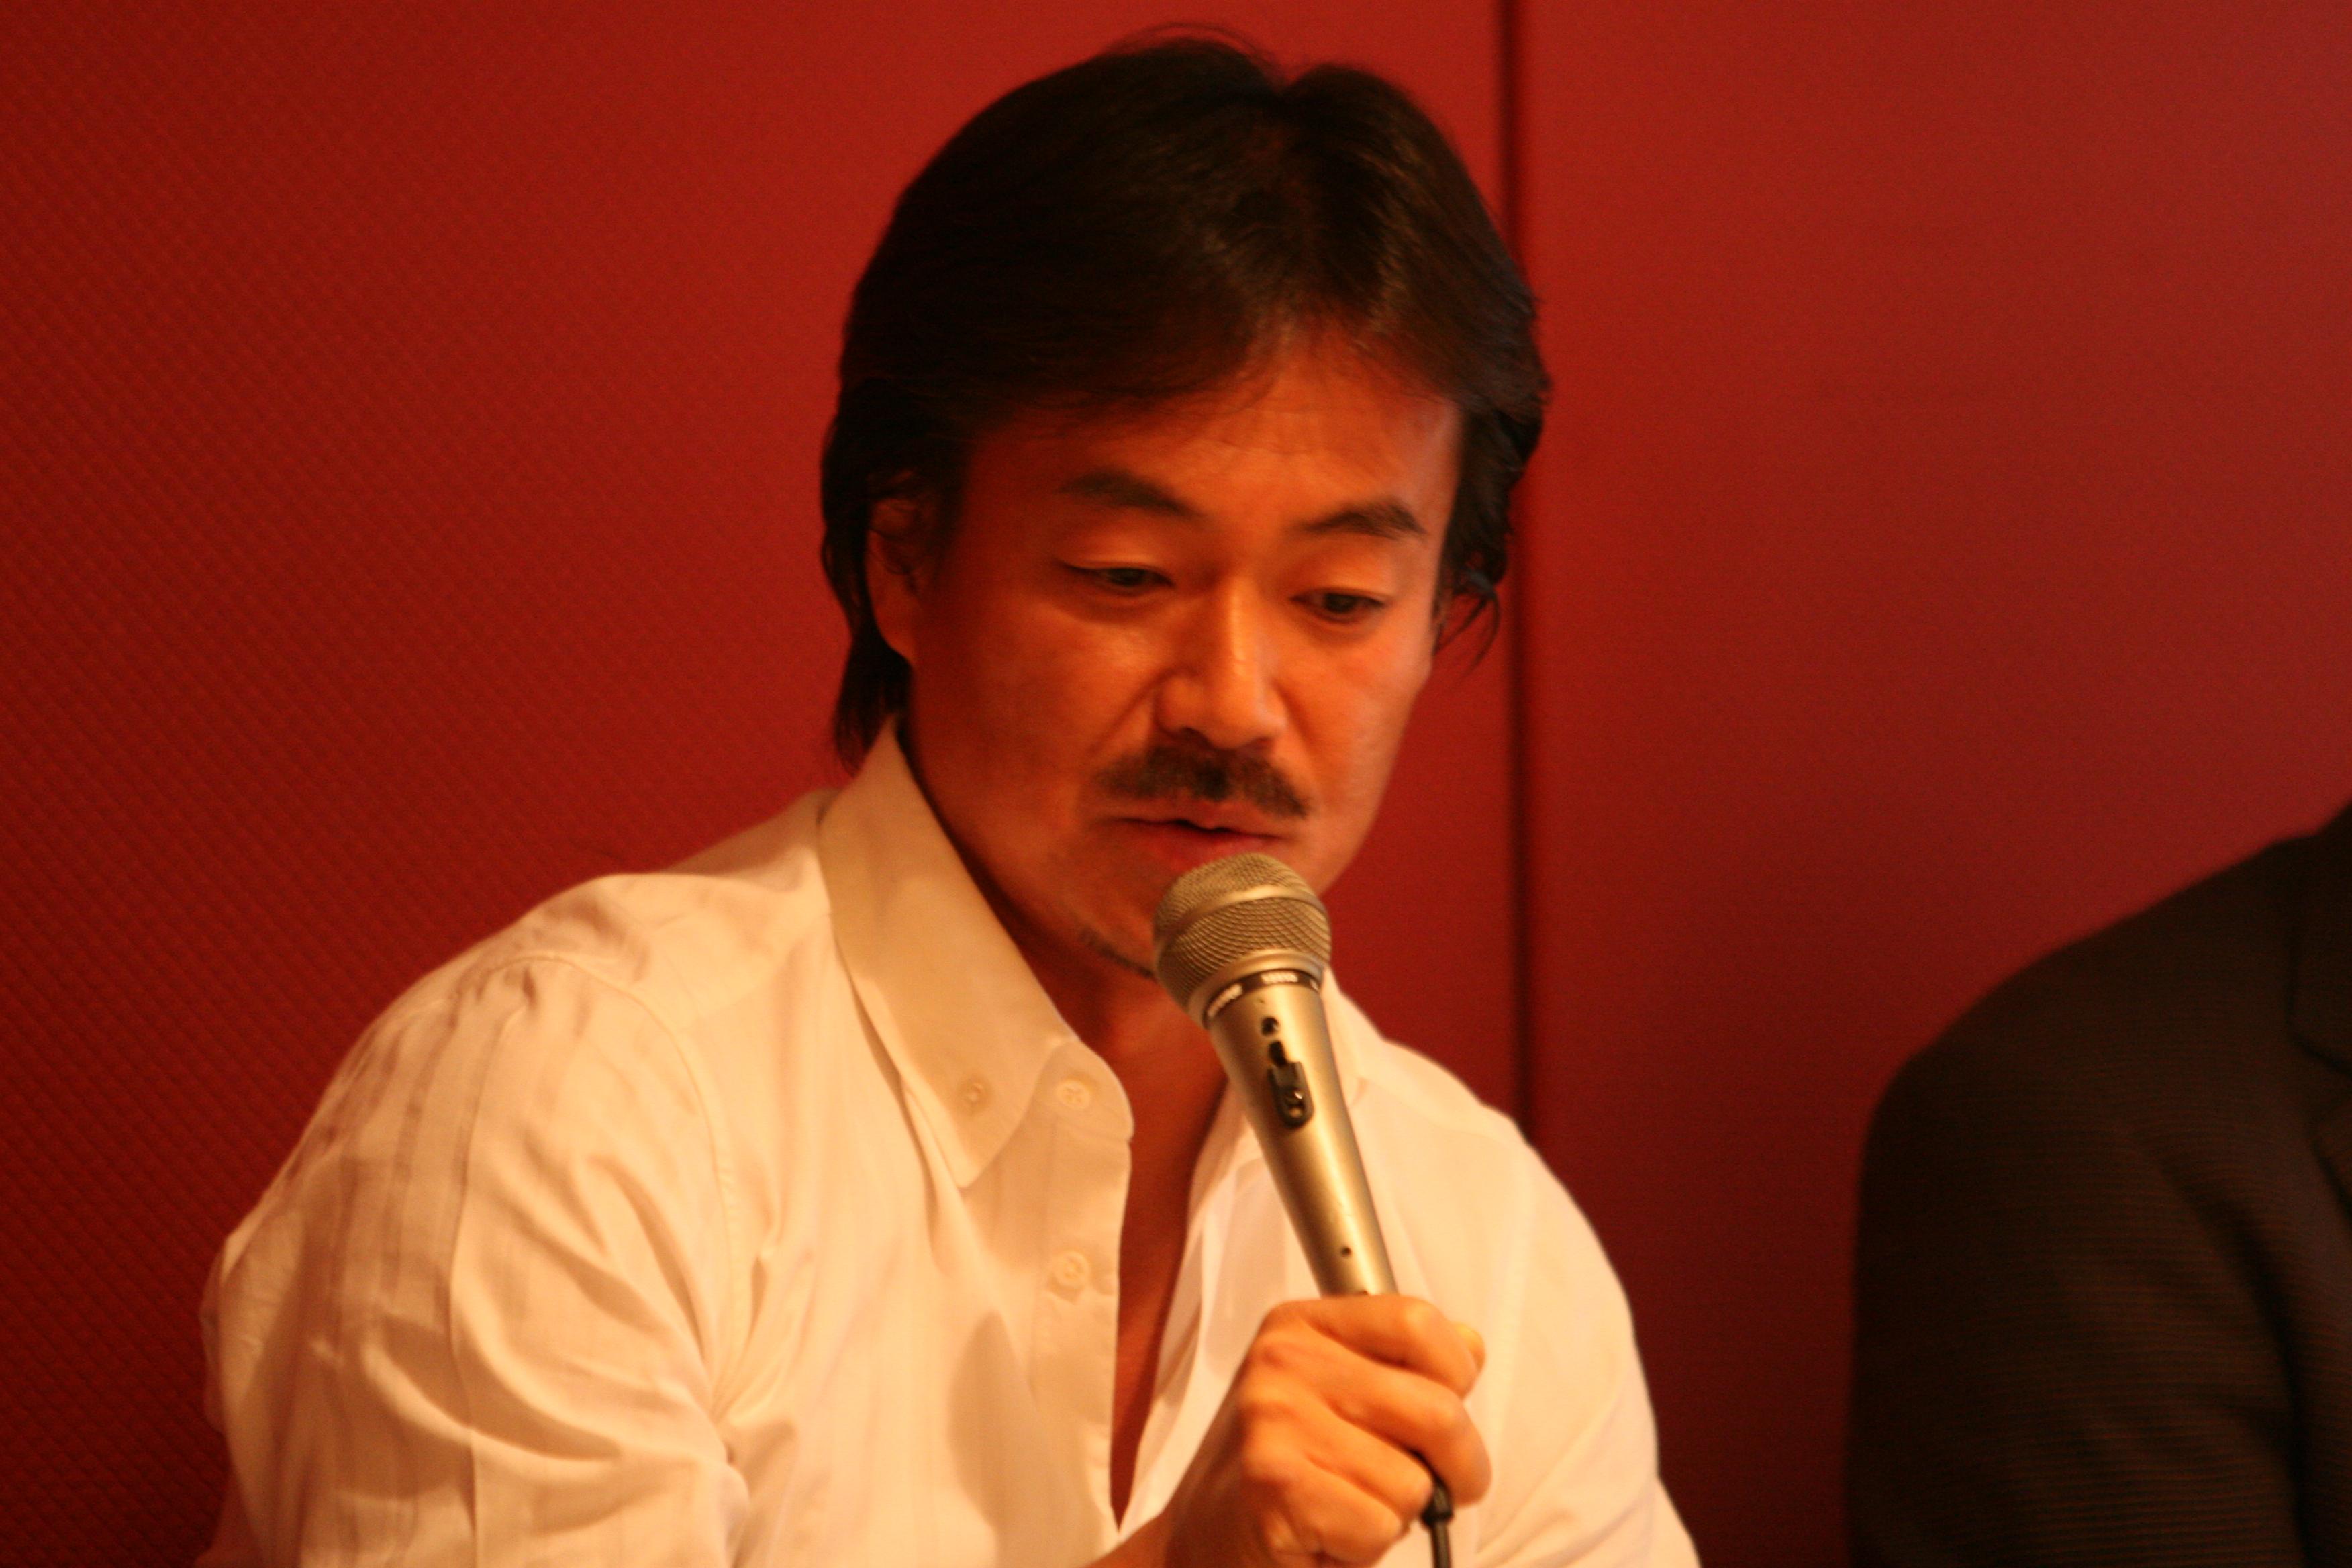 Series creator Hironobu Sakaguchi